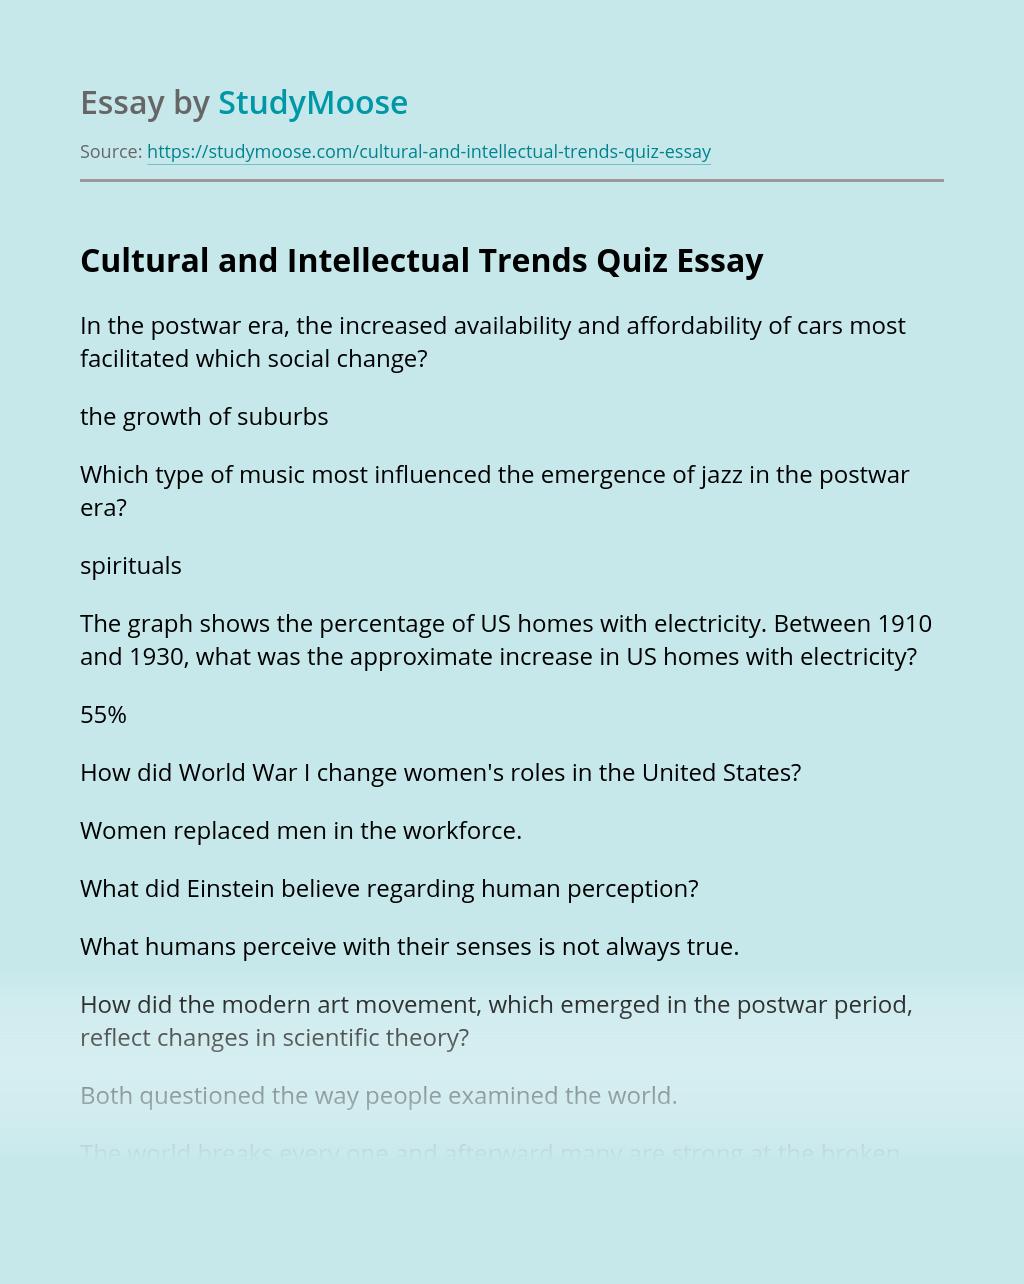 Cultural and Intellectual Trends Quiz